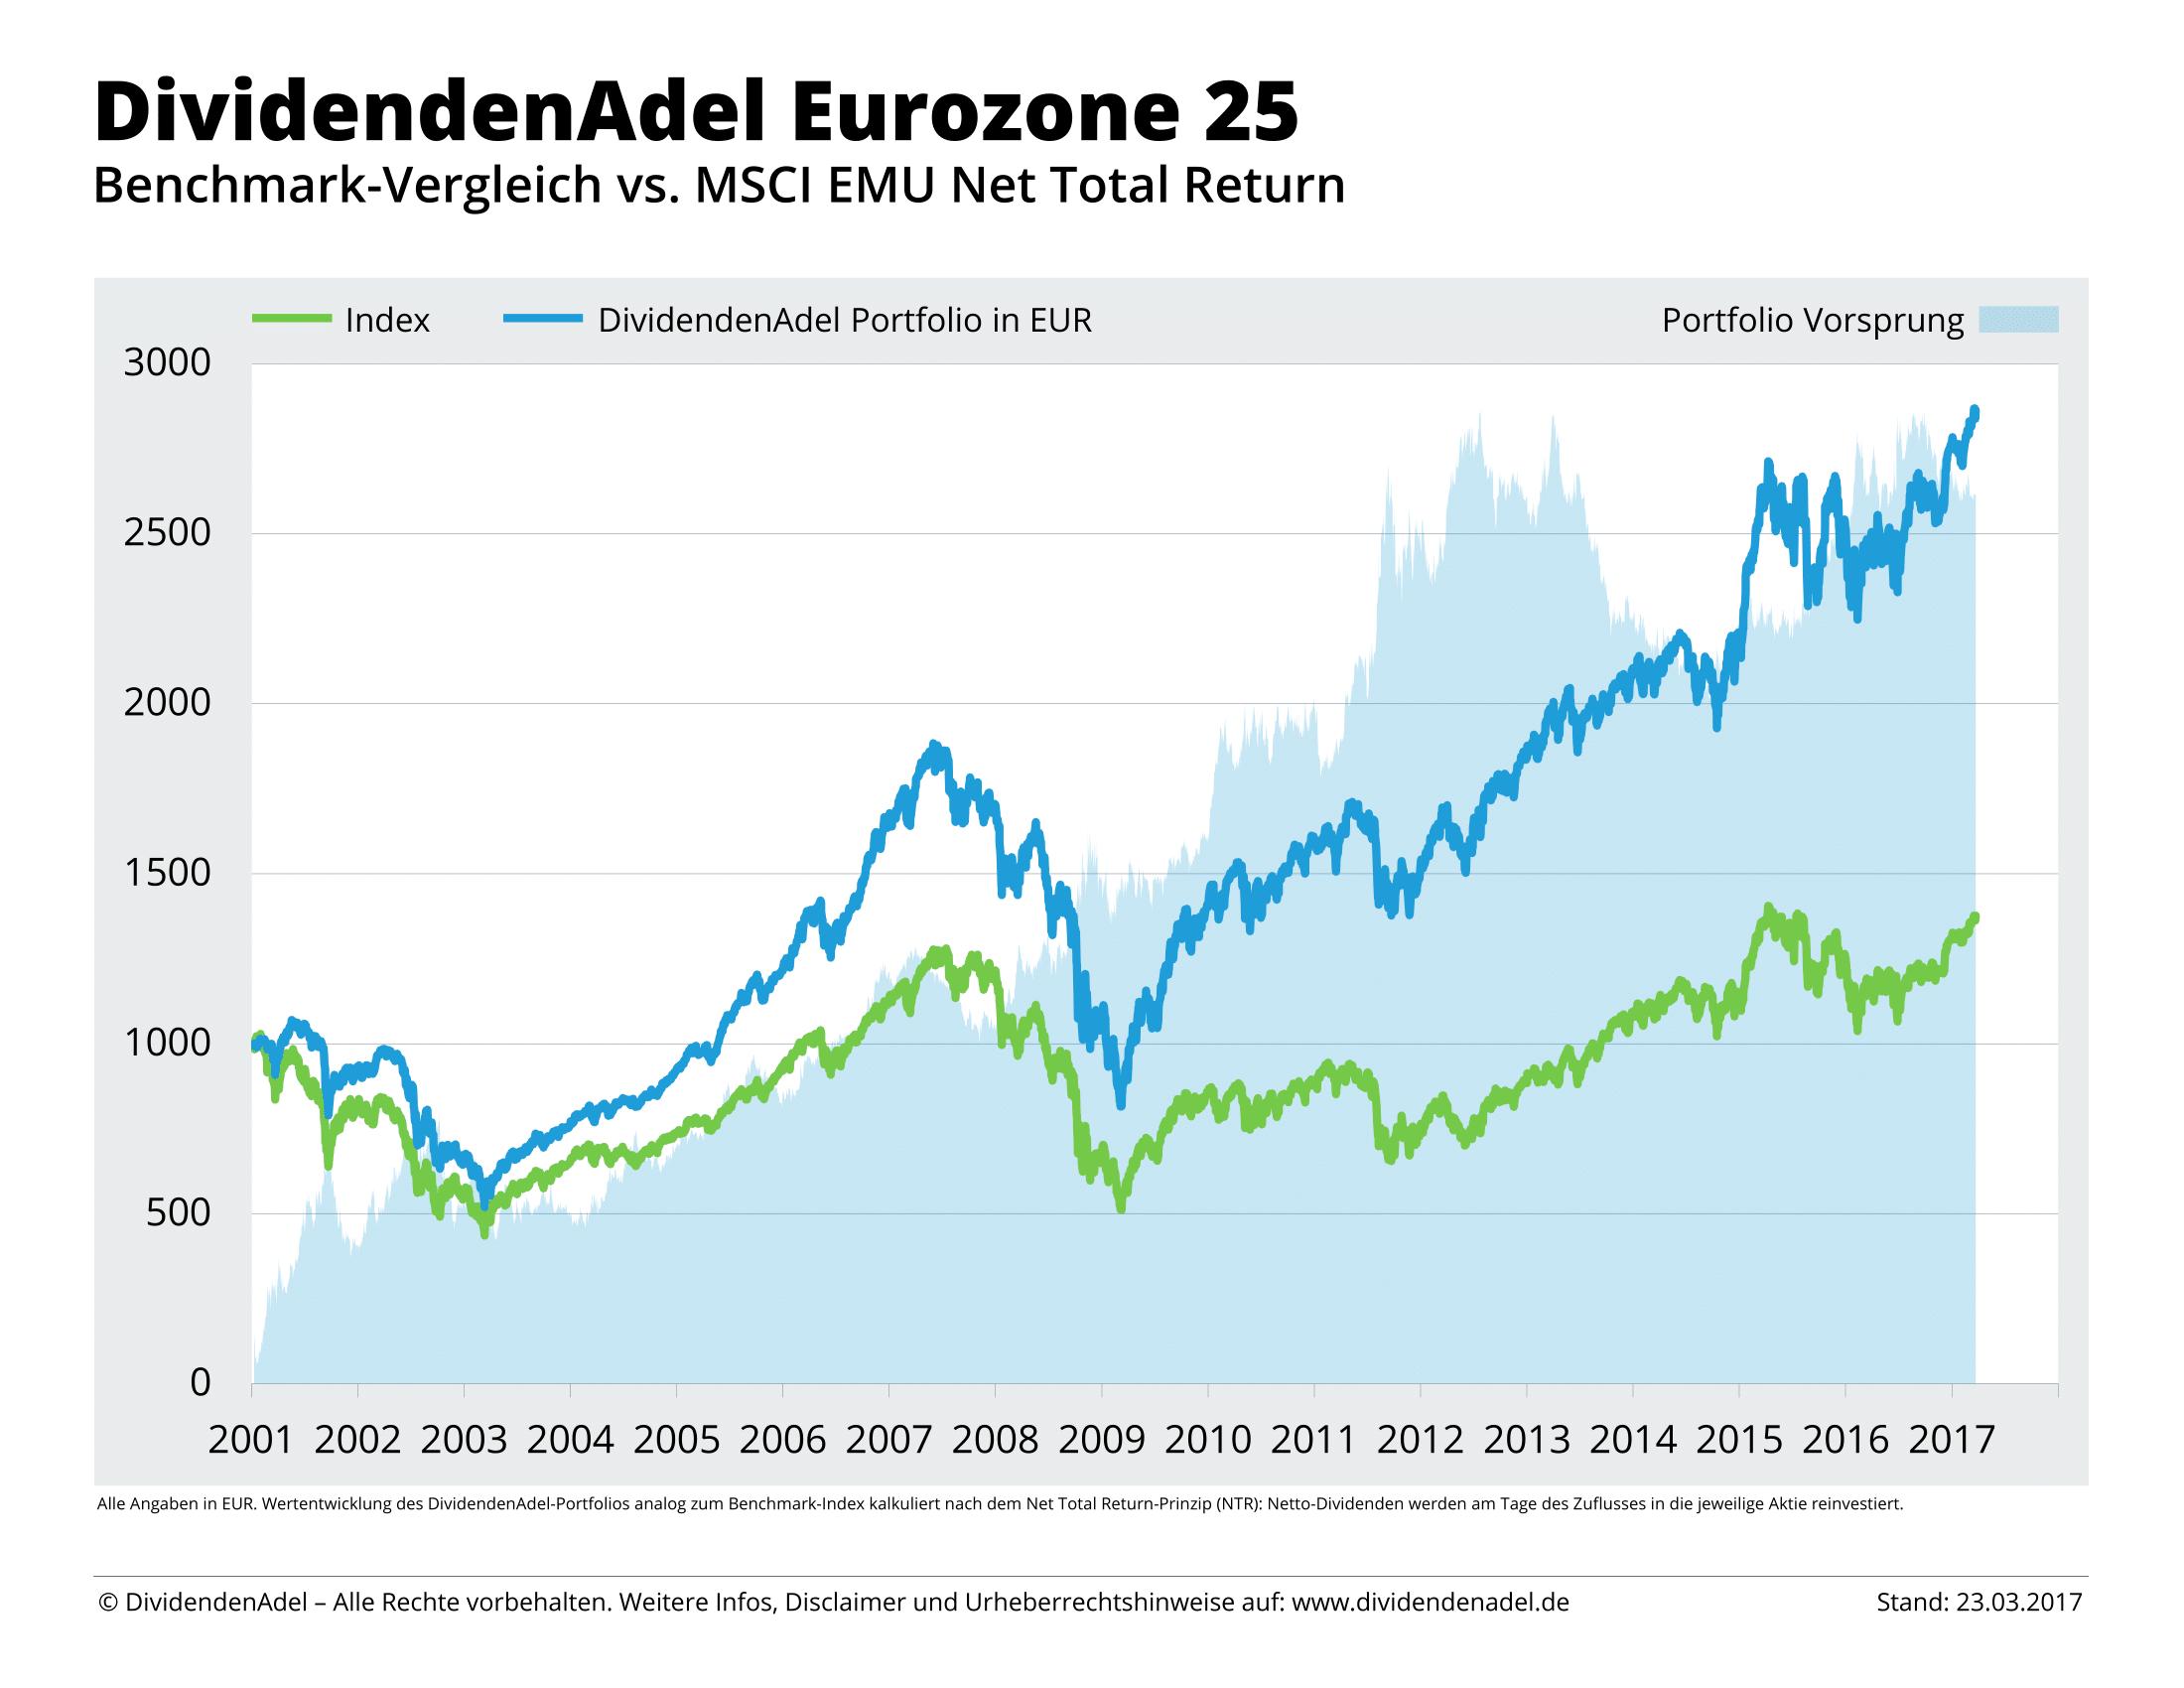 2017-03-23 NTR DividendenAdel Eurozone 25-1